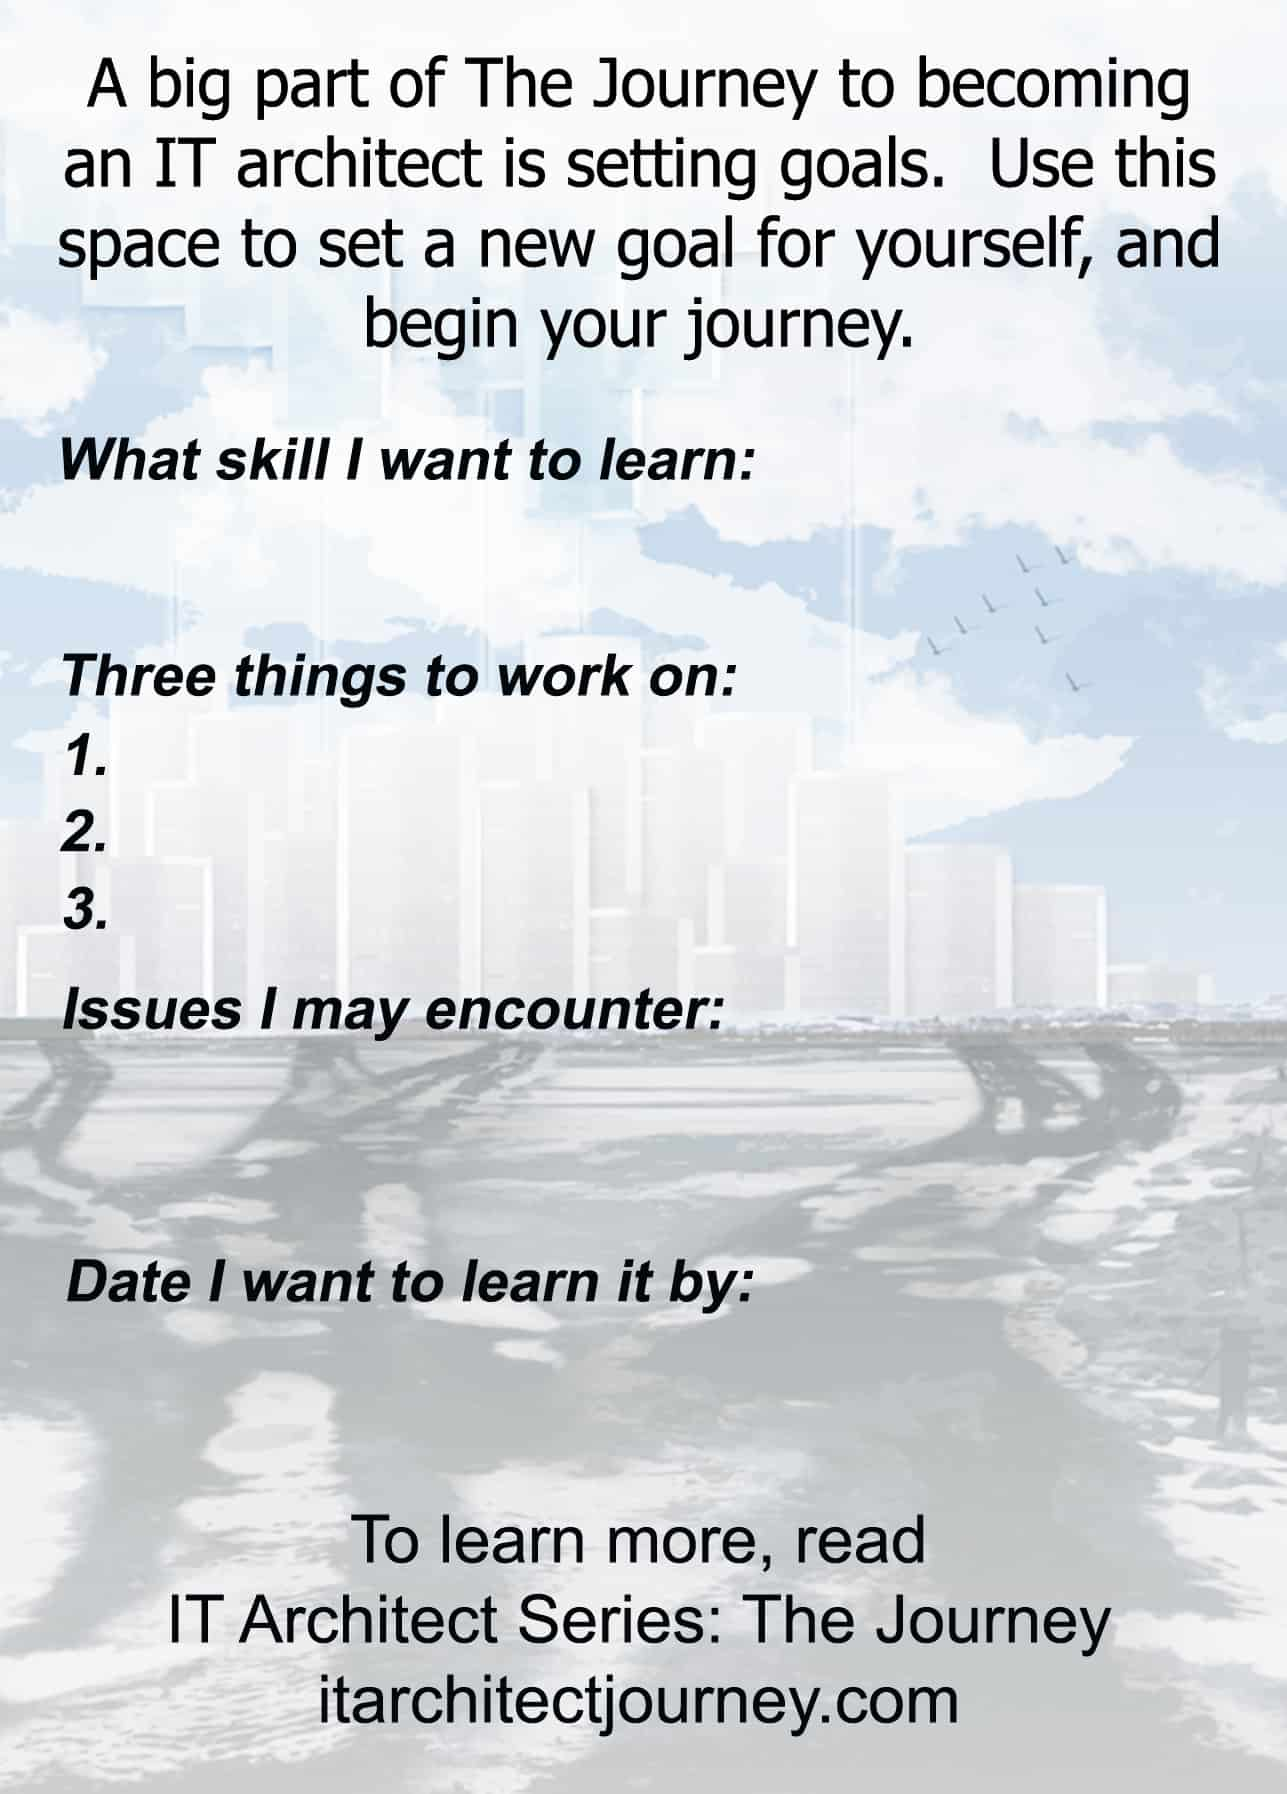 IT architect journey goal learning development